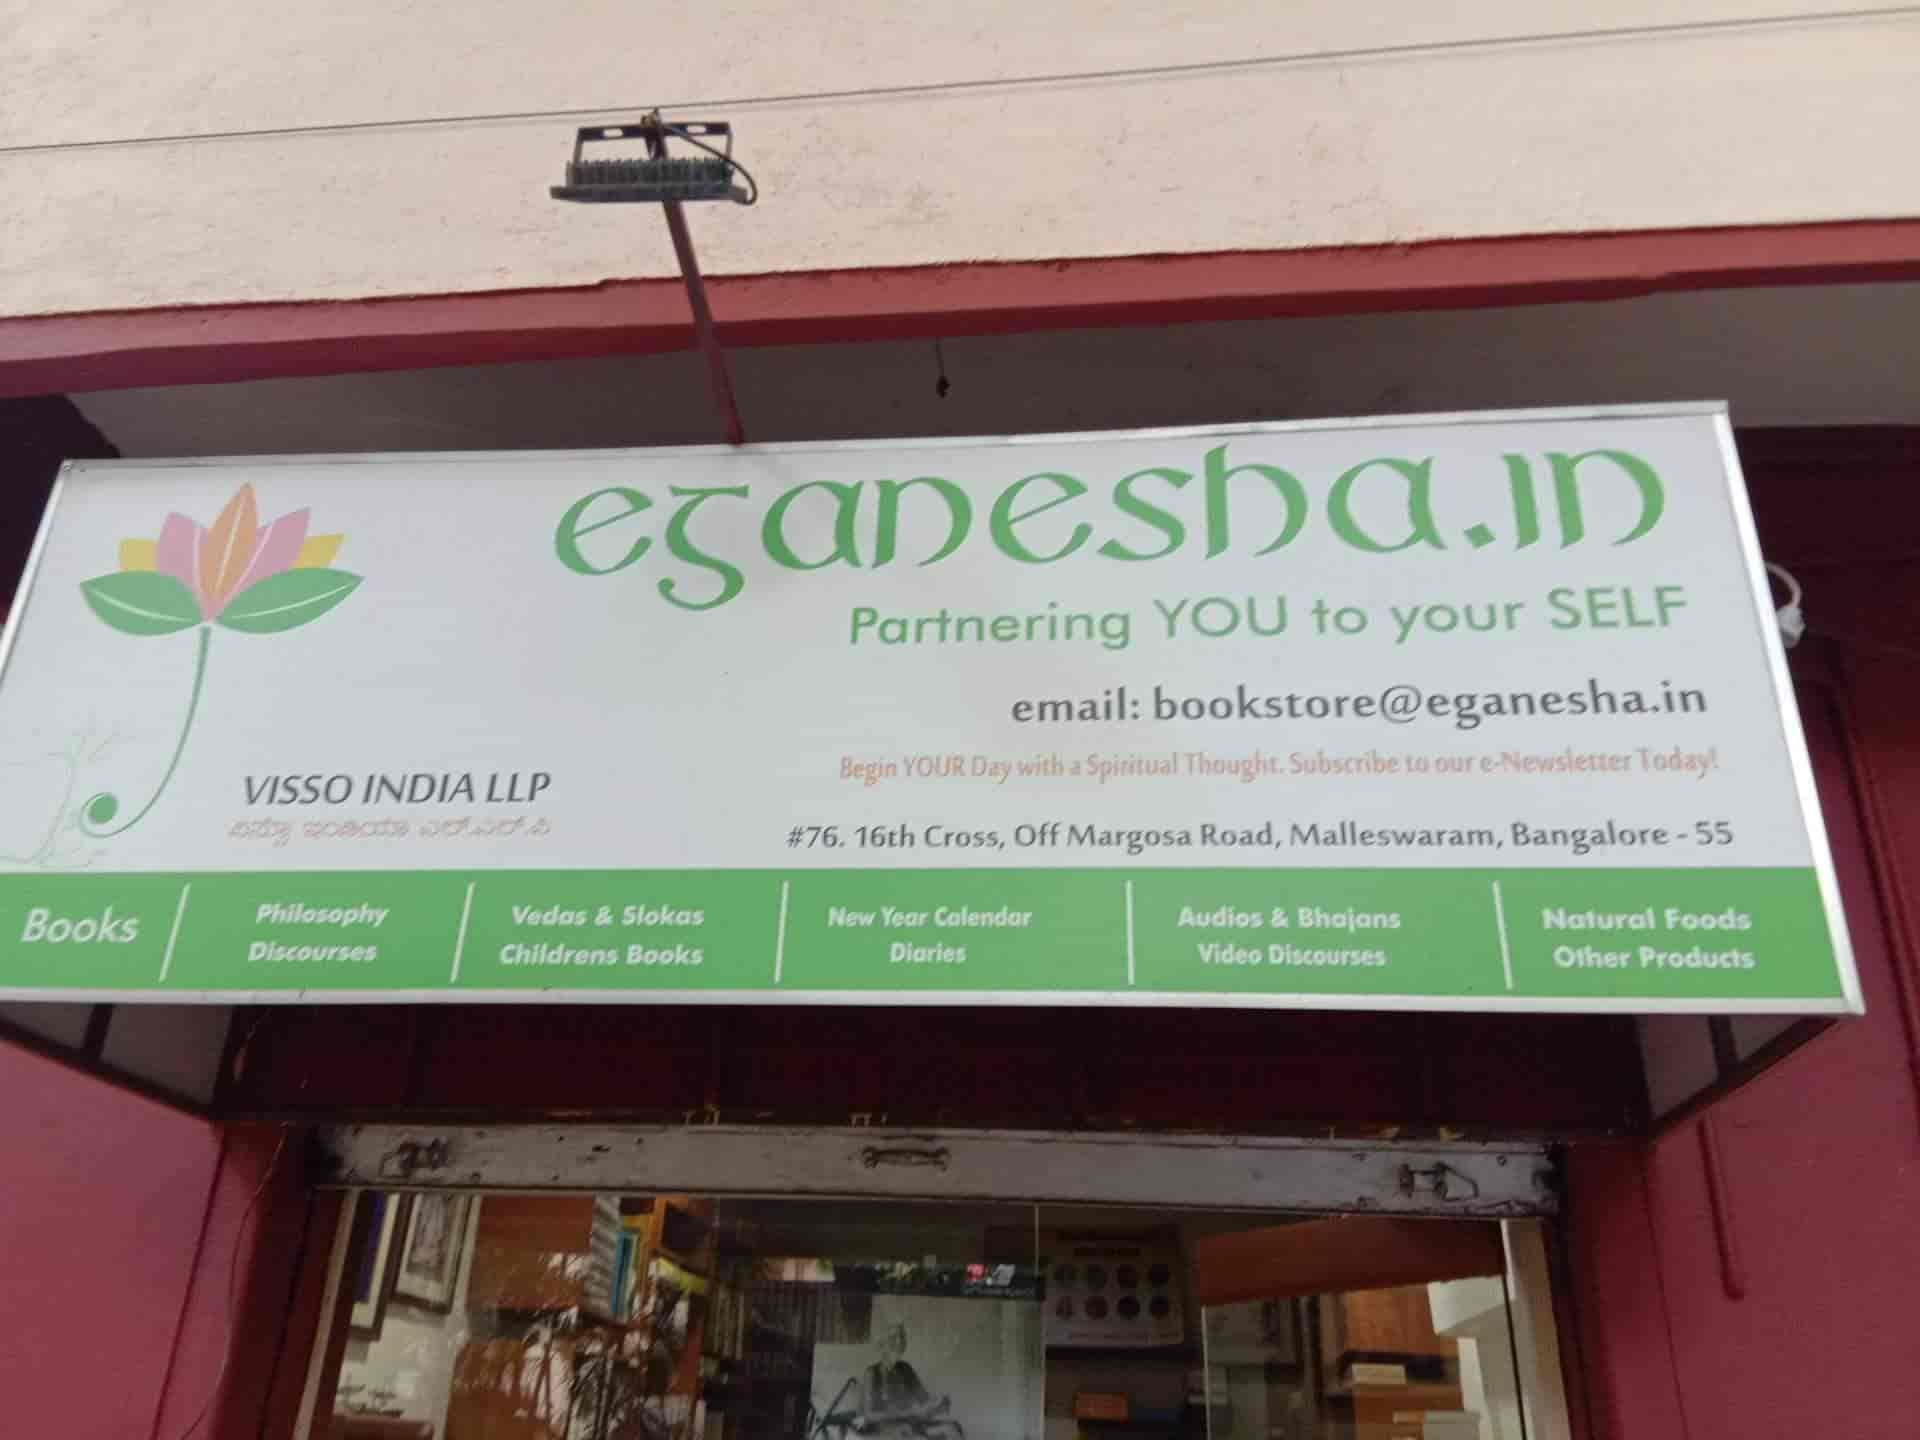 E Spiritual Book Store